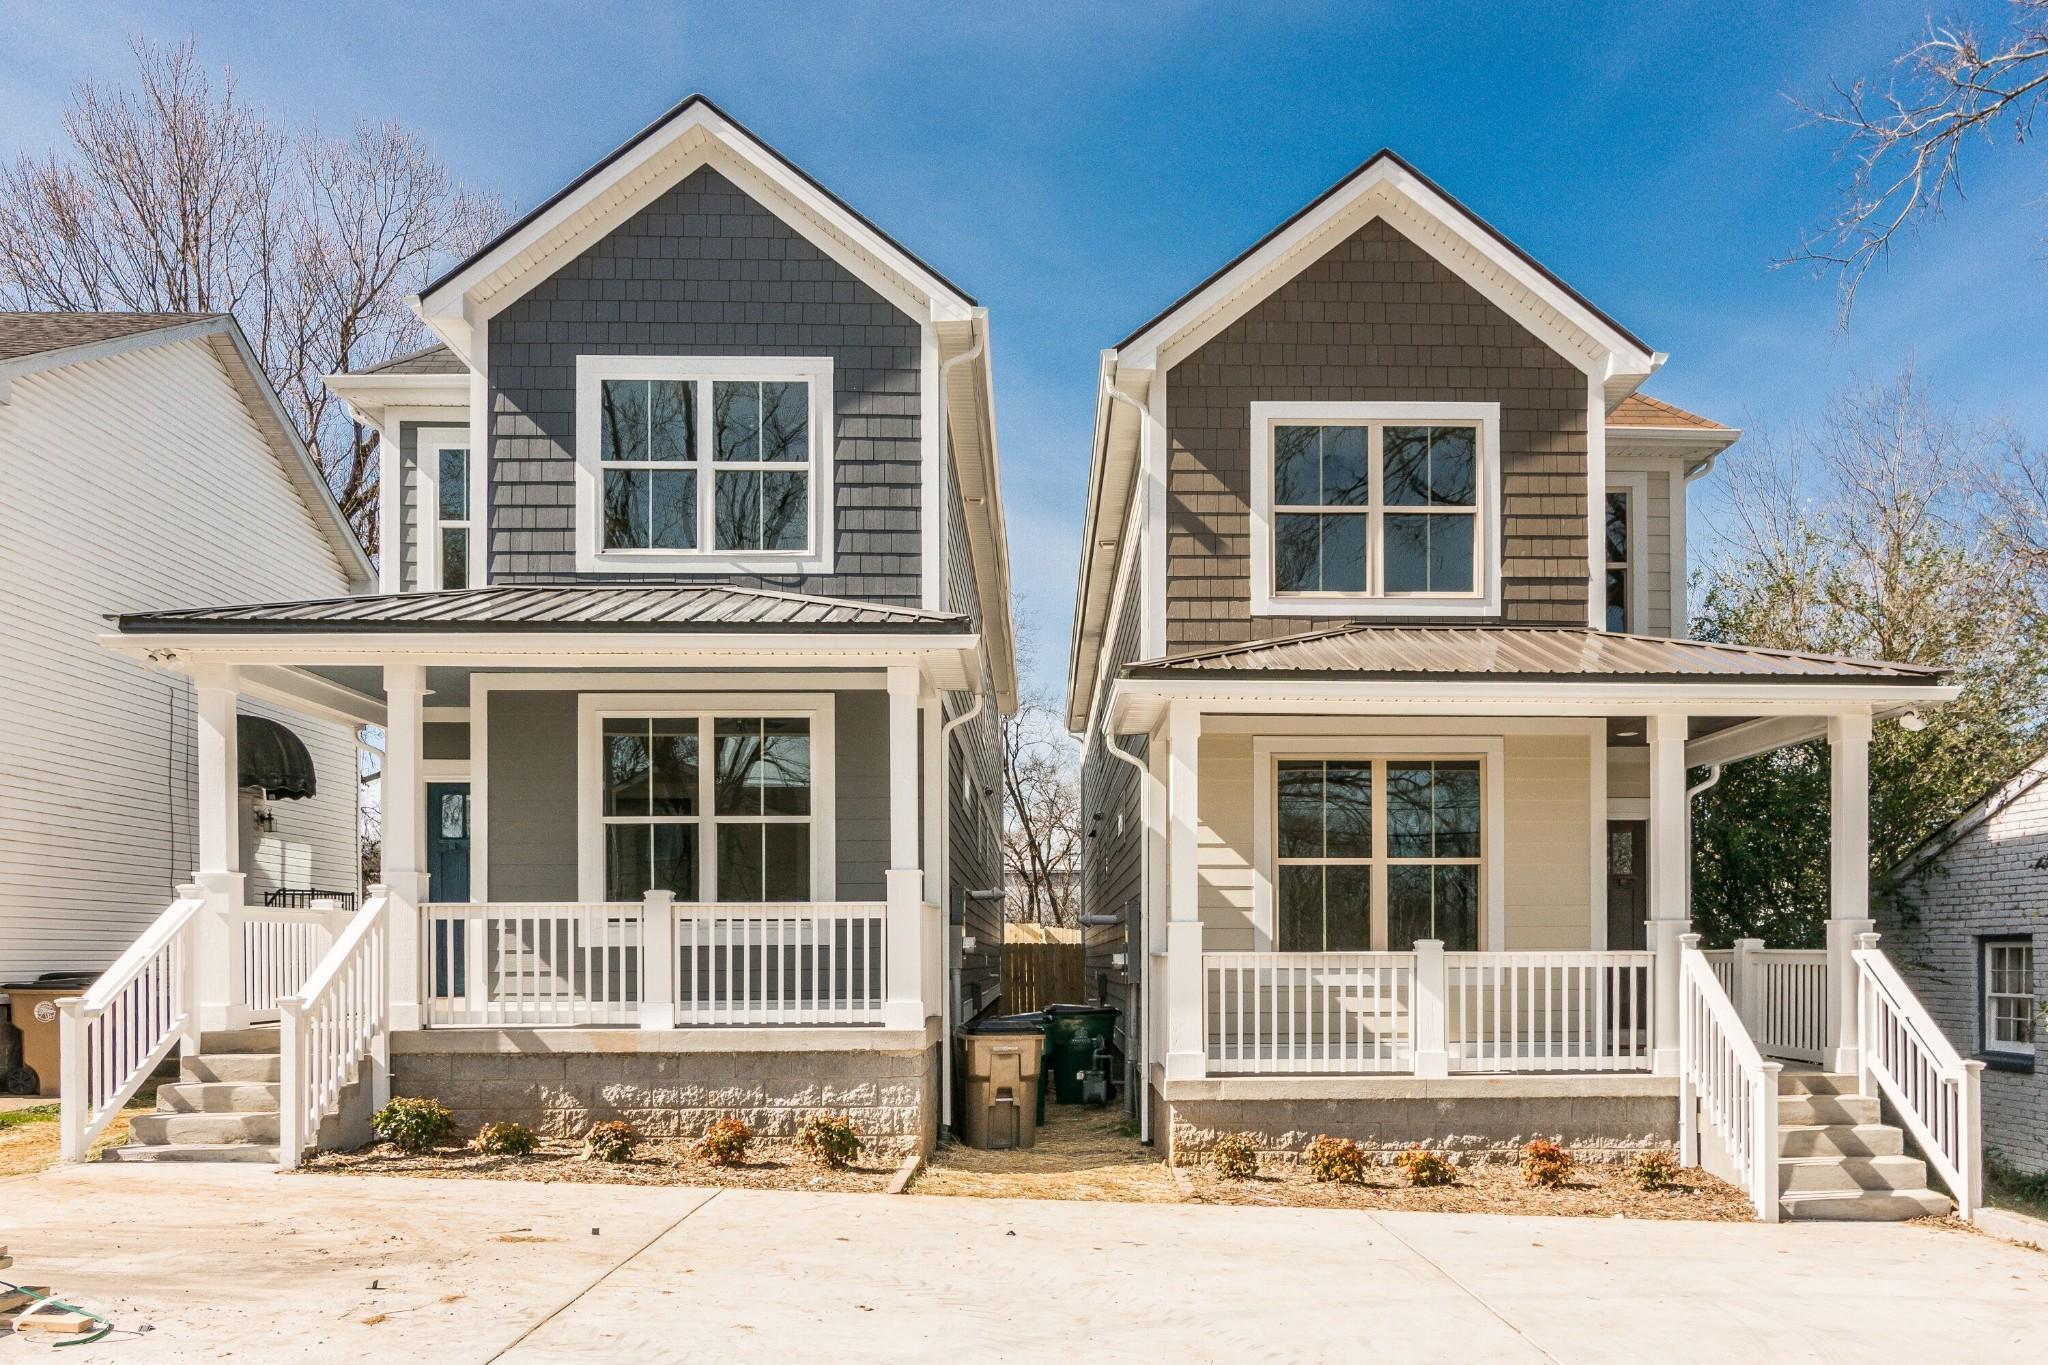 2719 Gear St, Nashville, TN 37216 - Nashville, TN real estate listing